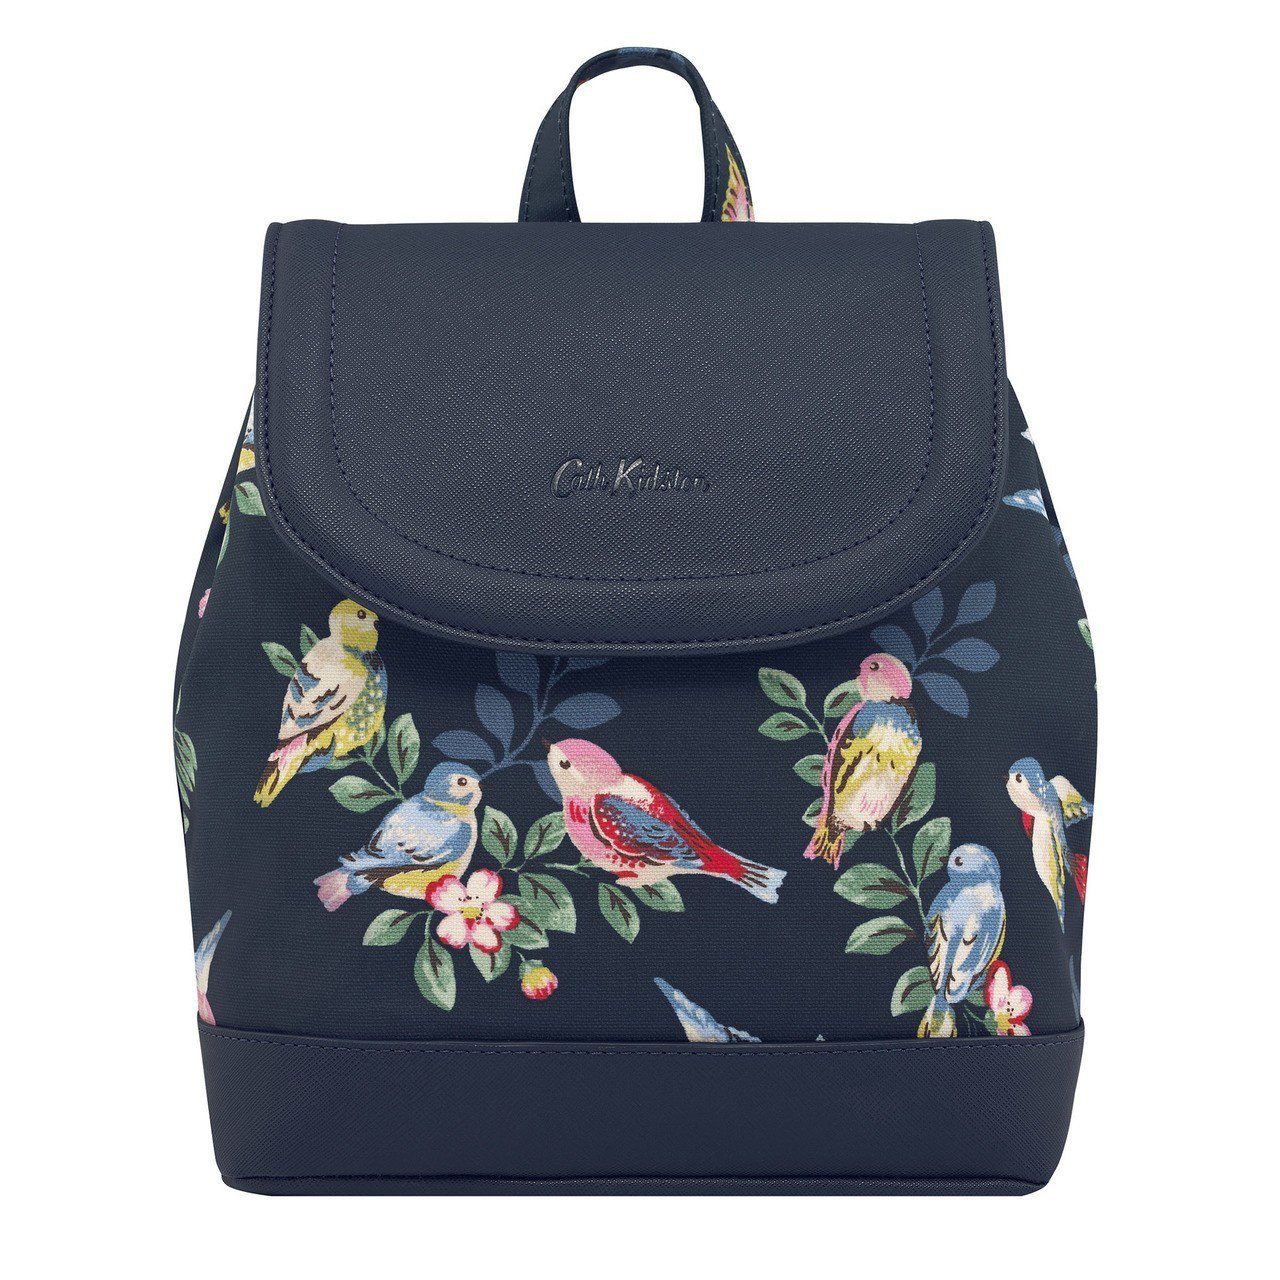 Spring birds後背包,3,280元。圖/Cath Kidston提供